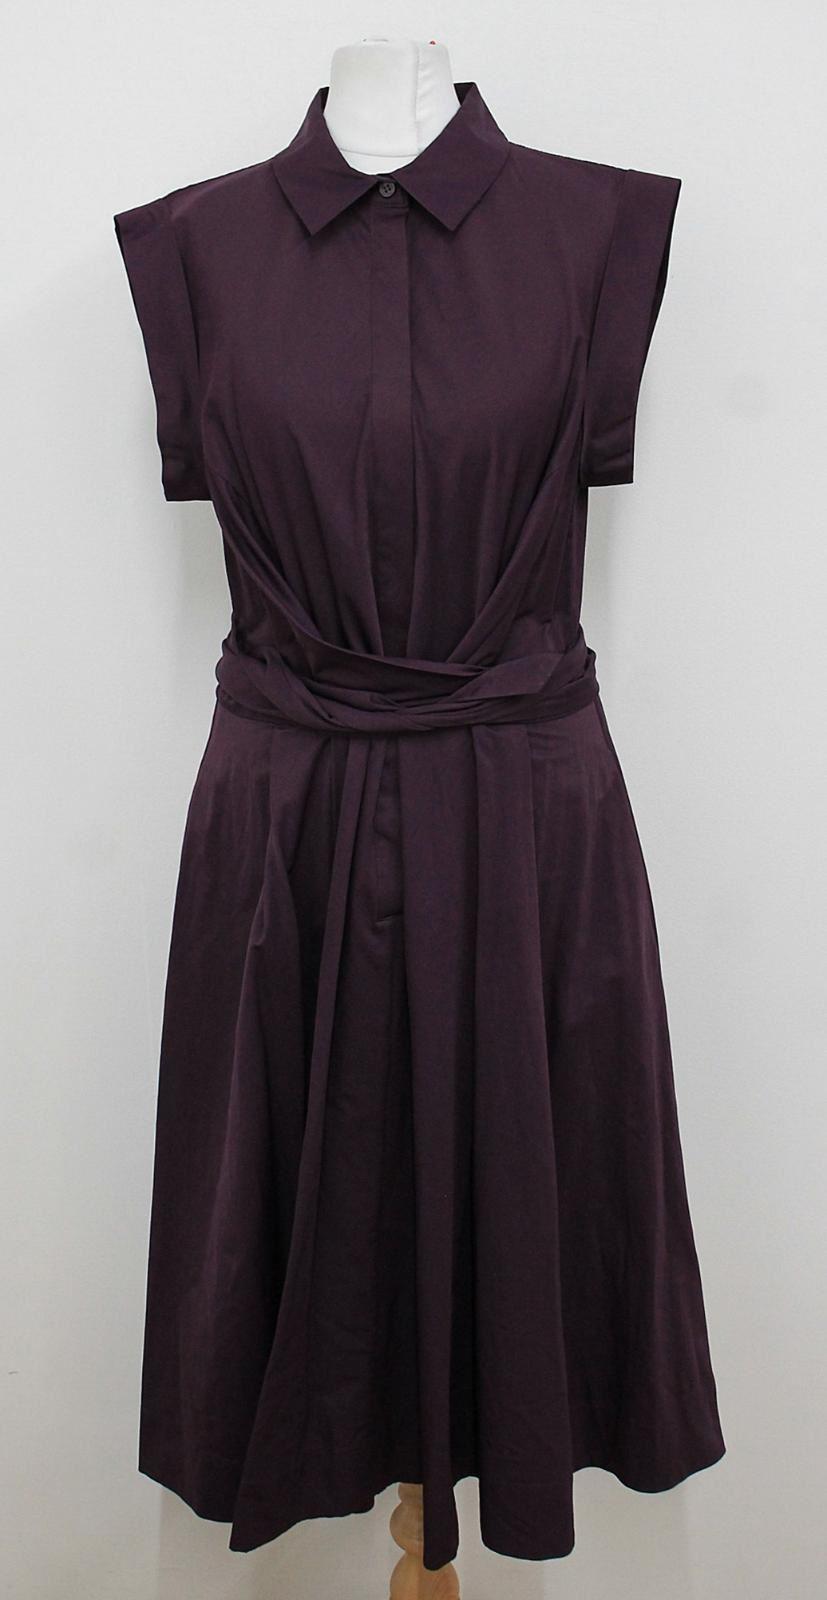 Hobbs-Damen-Light-aubergine-Cap-Armel-Belted-Gables-Shirt-Kleid-uk14-NEU